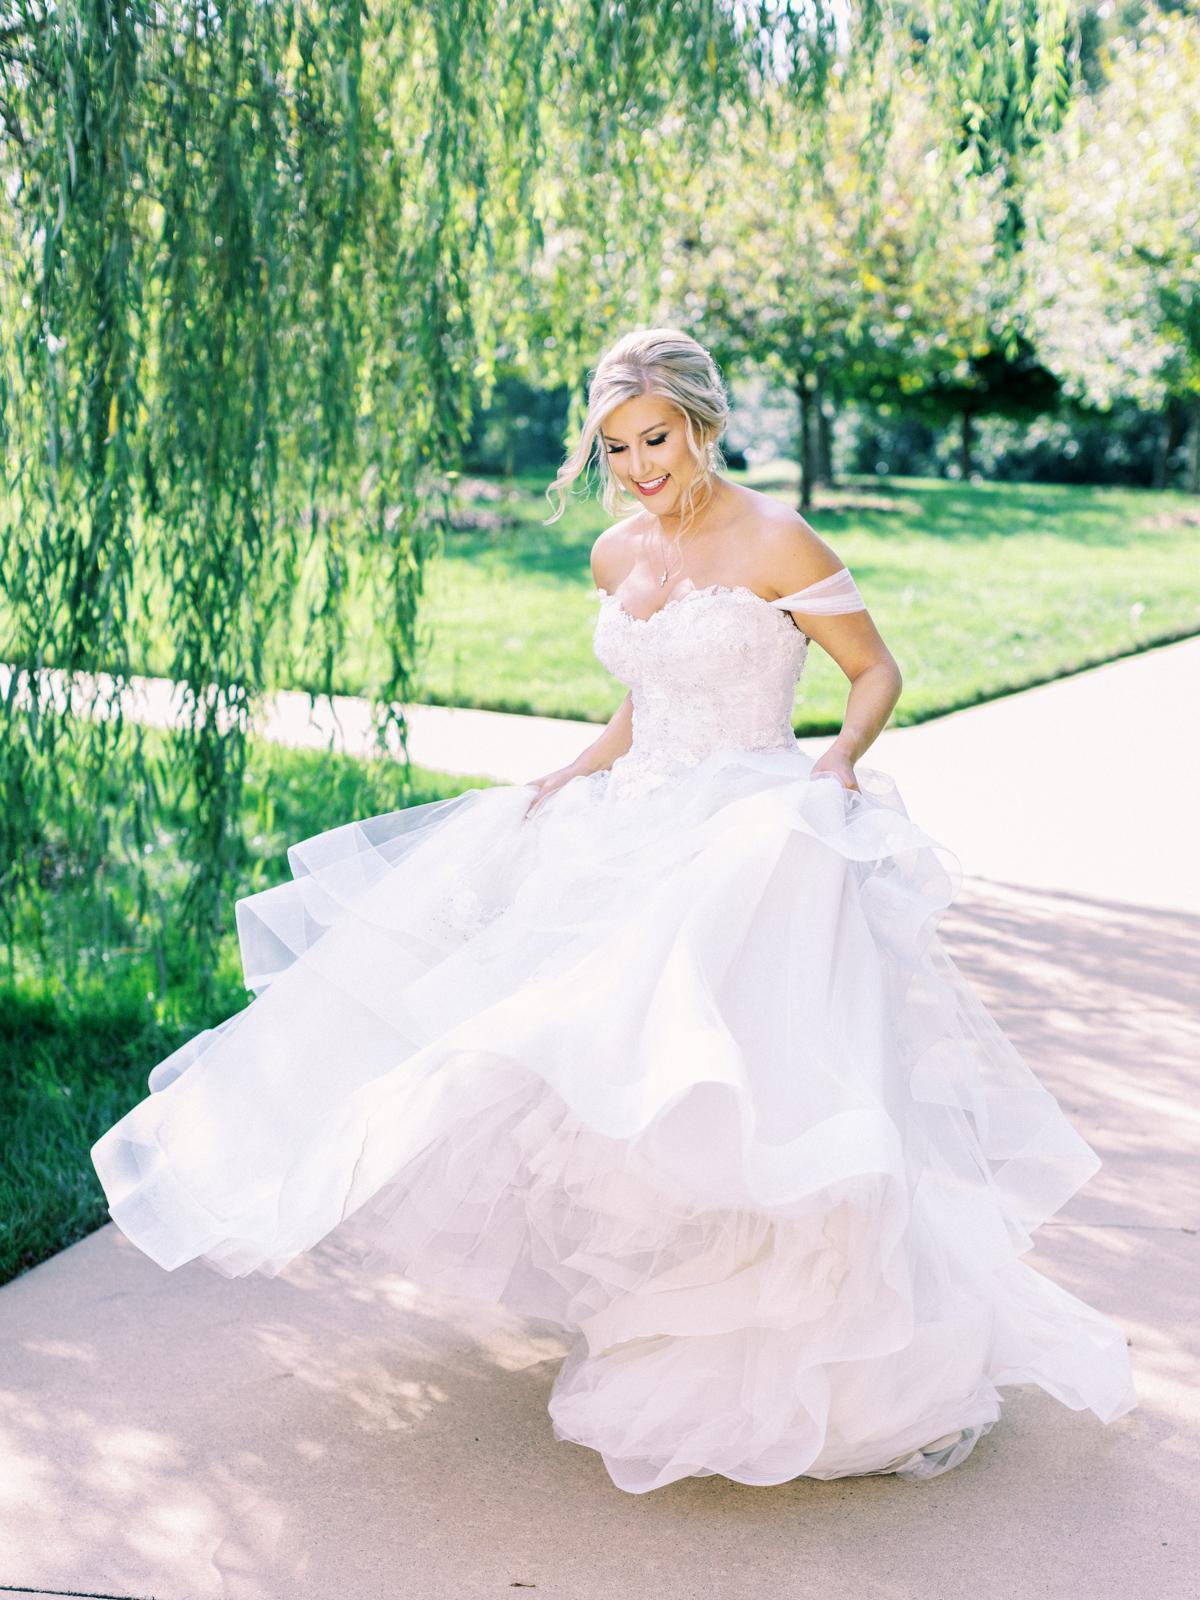 winmock-kinderton-wedding-020.jpg